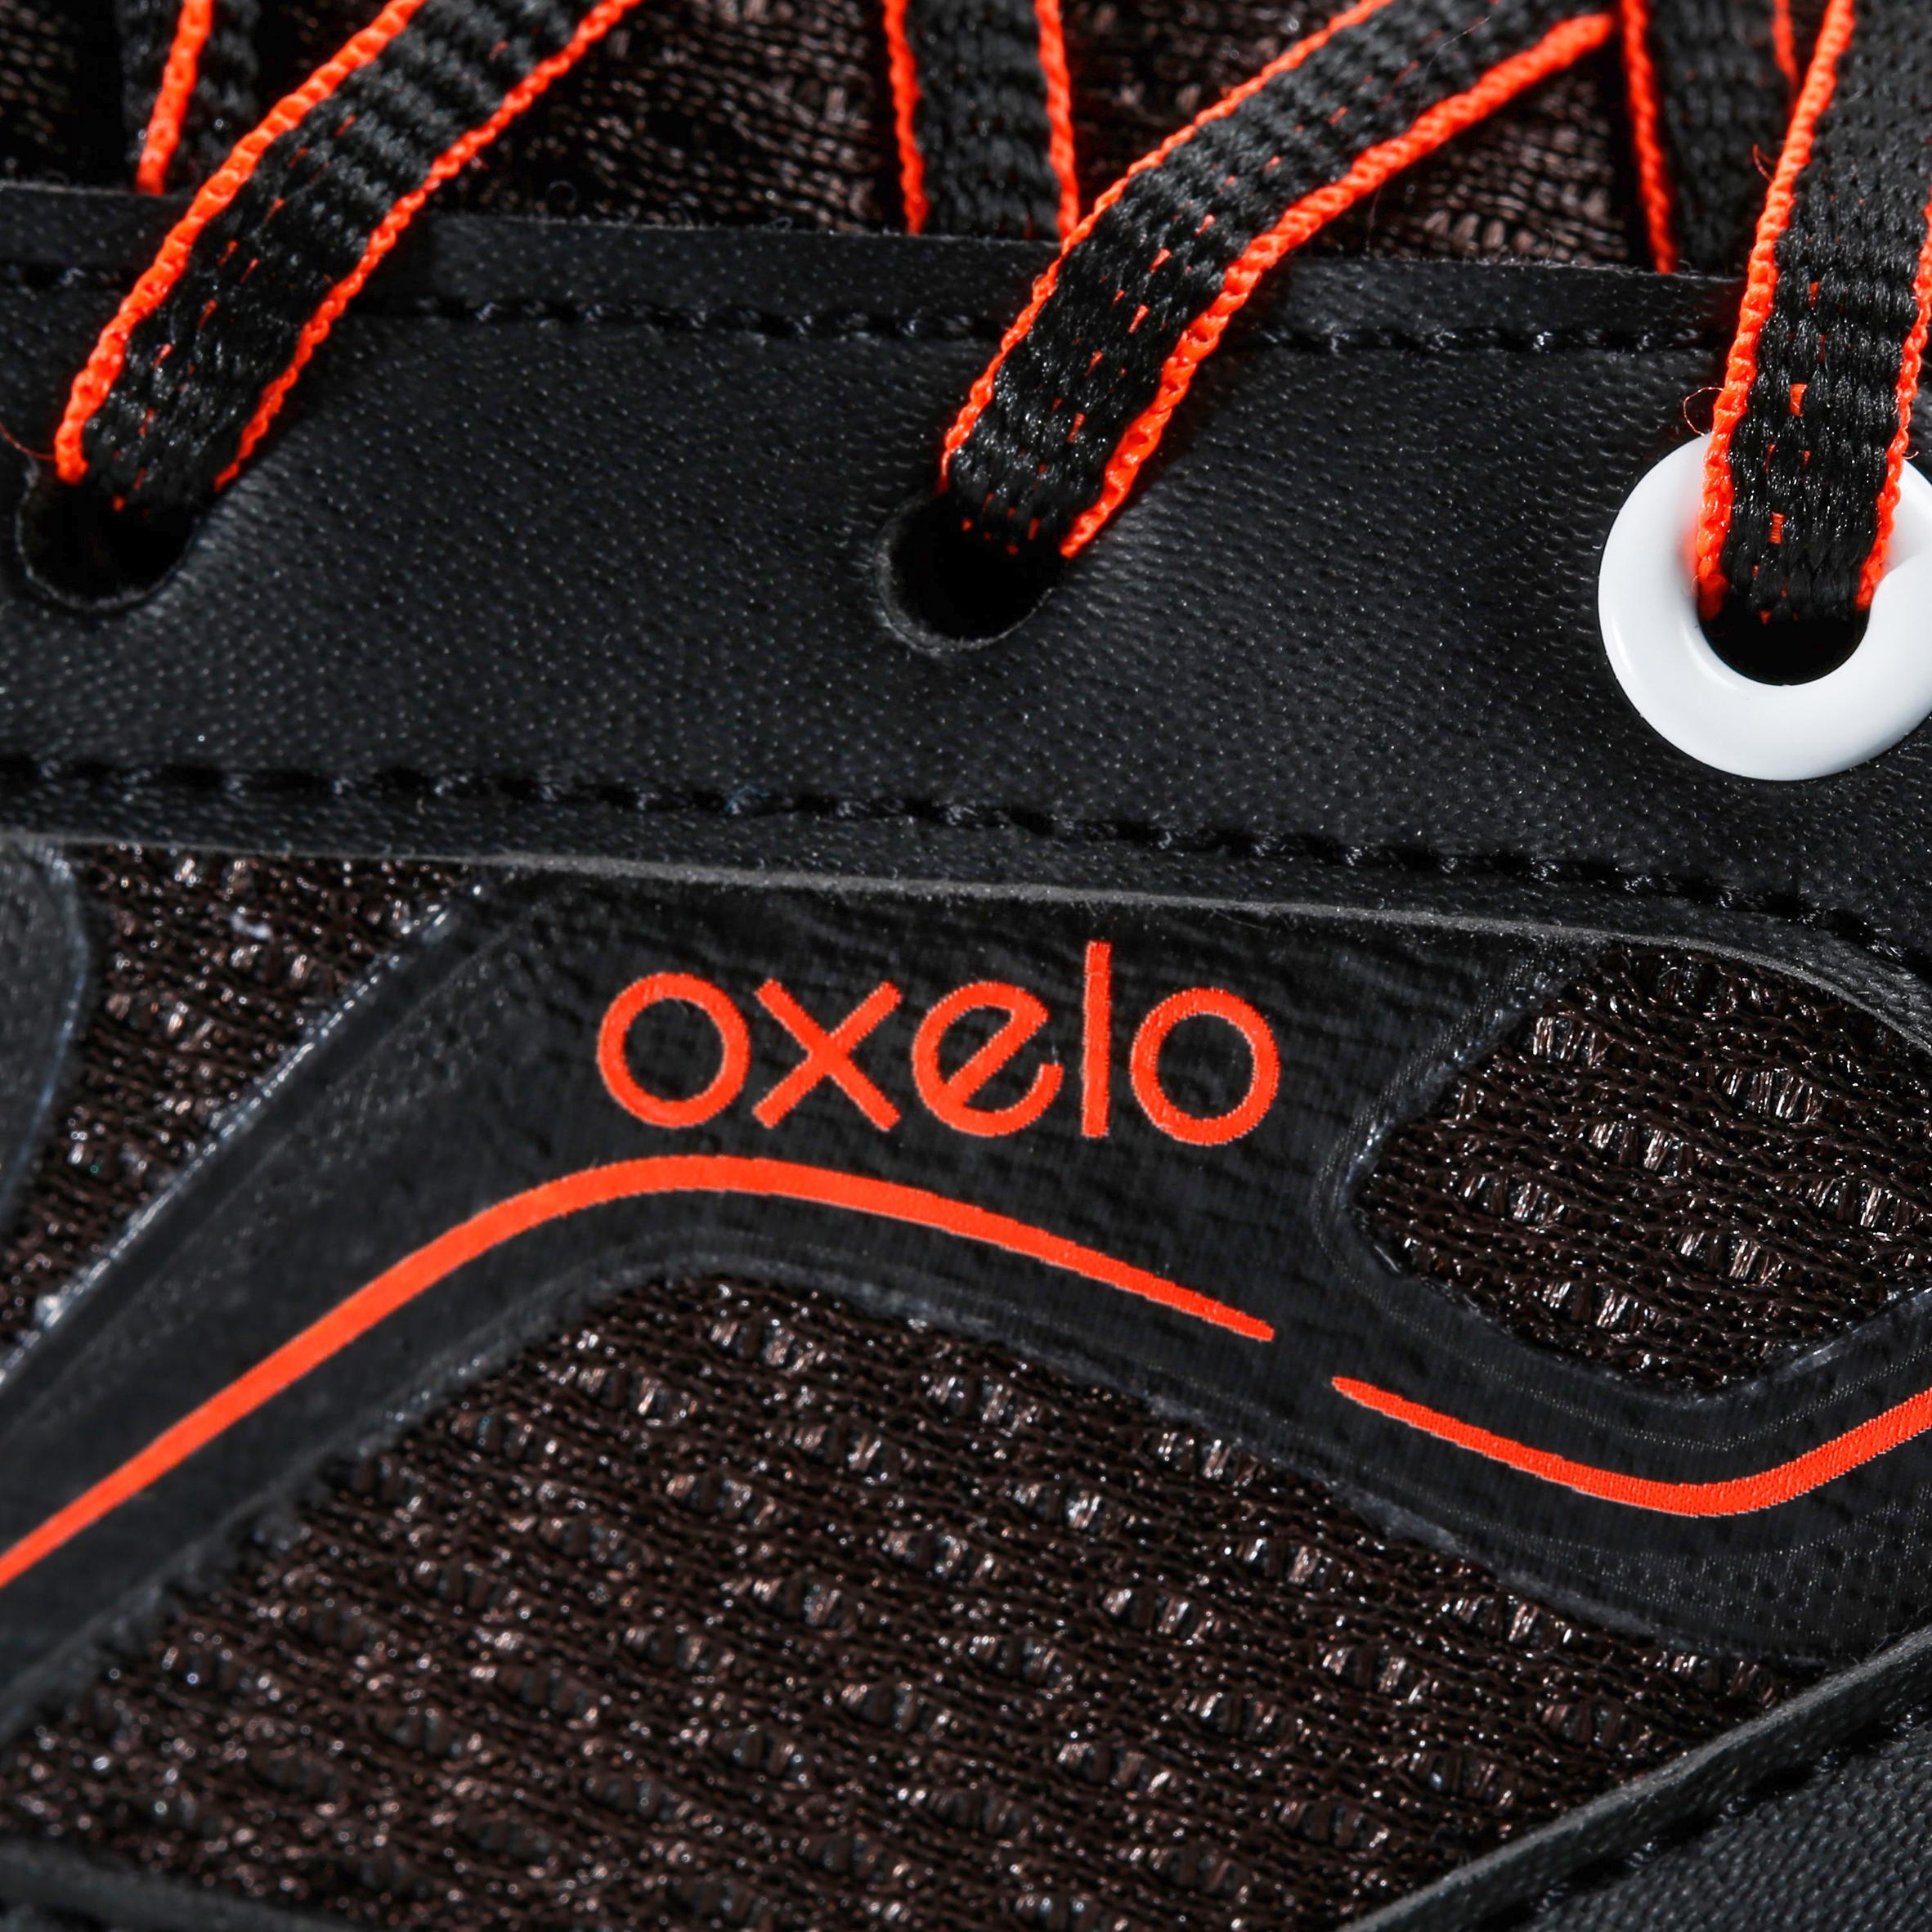 64165de1c Fit 3 Kids' Fitness Skates - Black/Orange - PT Decathlon Sports ...